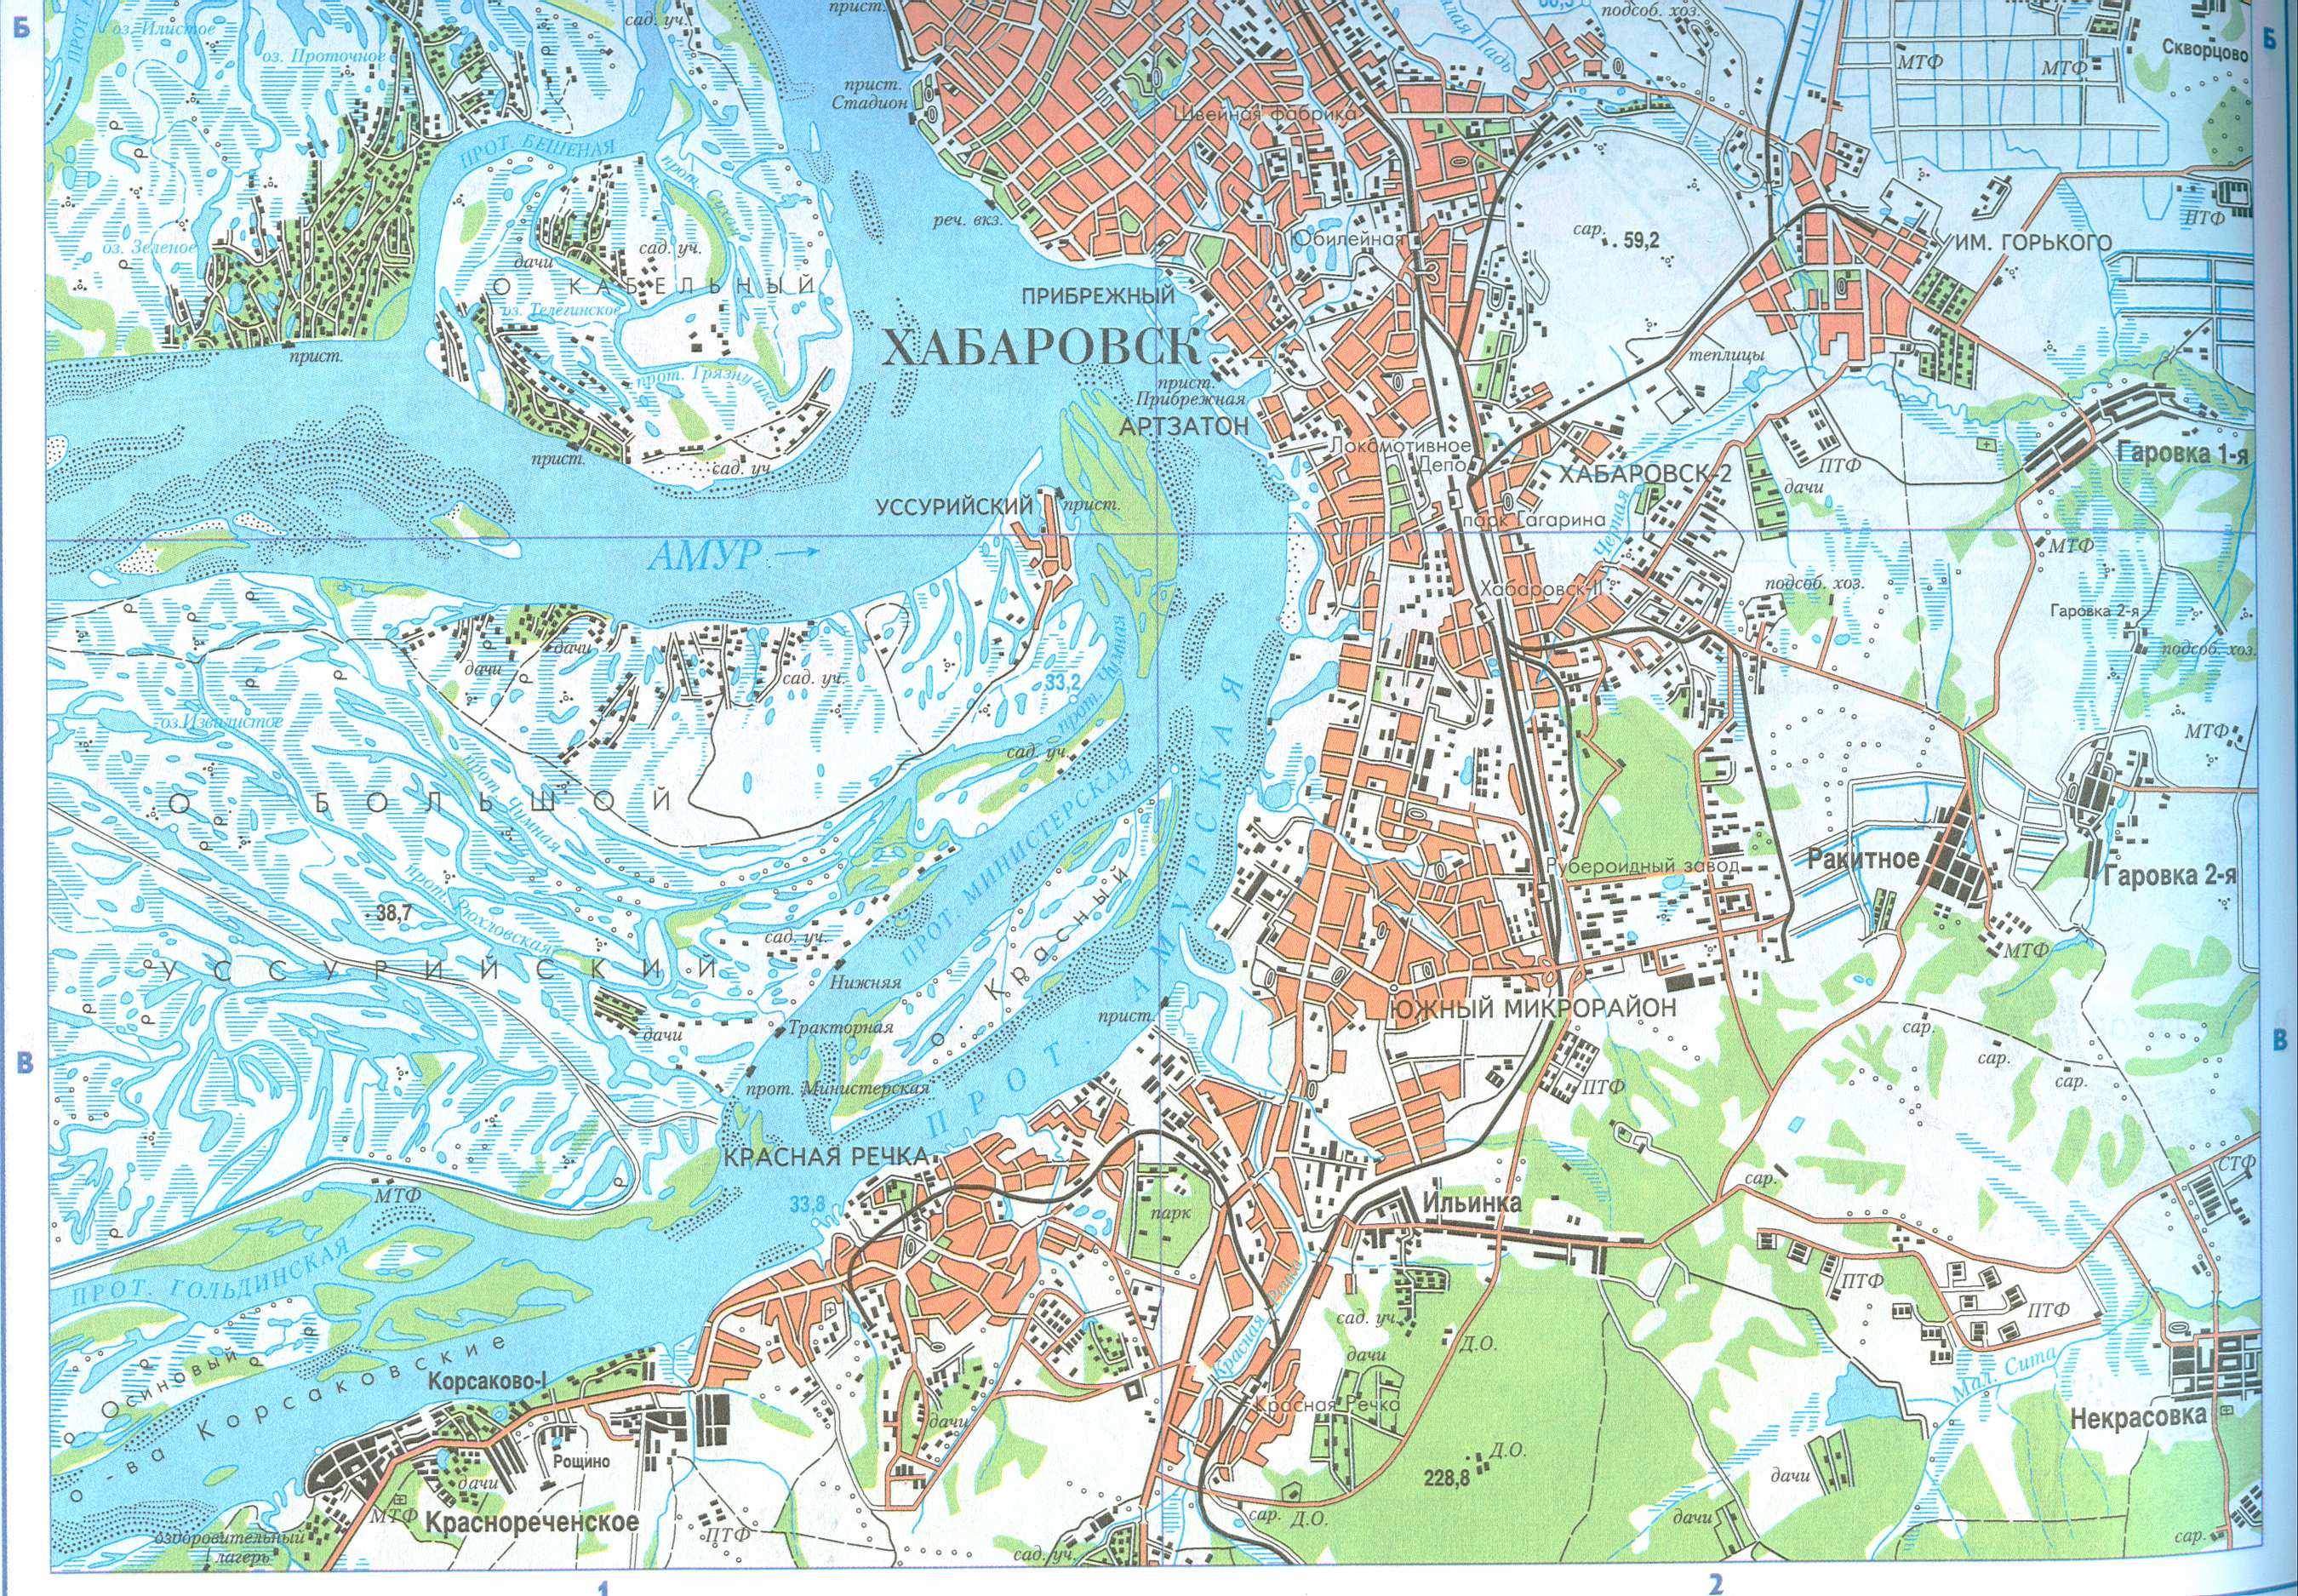 Карта Хабаровска. Подробная карта города Хабаровск 1см ...: http://www.raster-maps.com/map-of-russia-435/